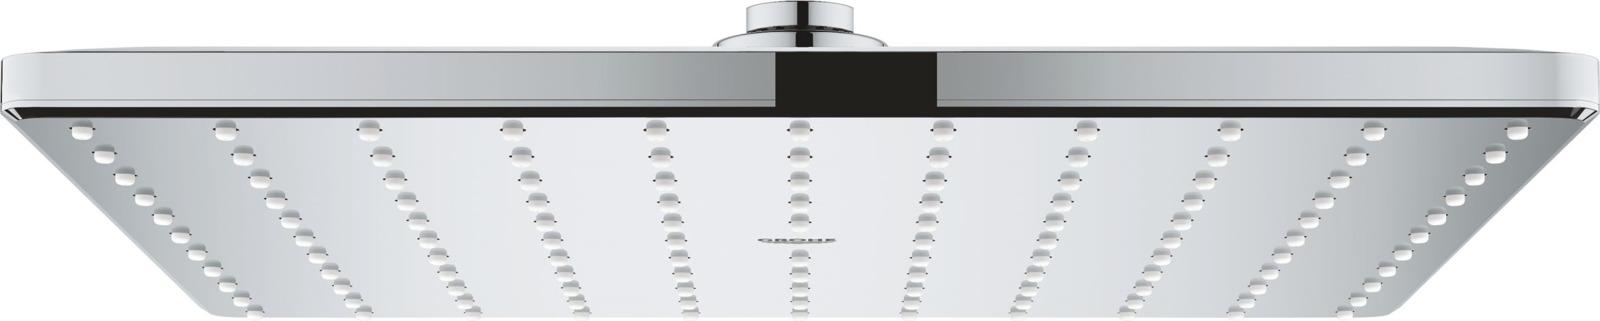 Верхний душ Grohe Rainshower 310 Mono, квадратный, 26568000, серебристый, 31 см